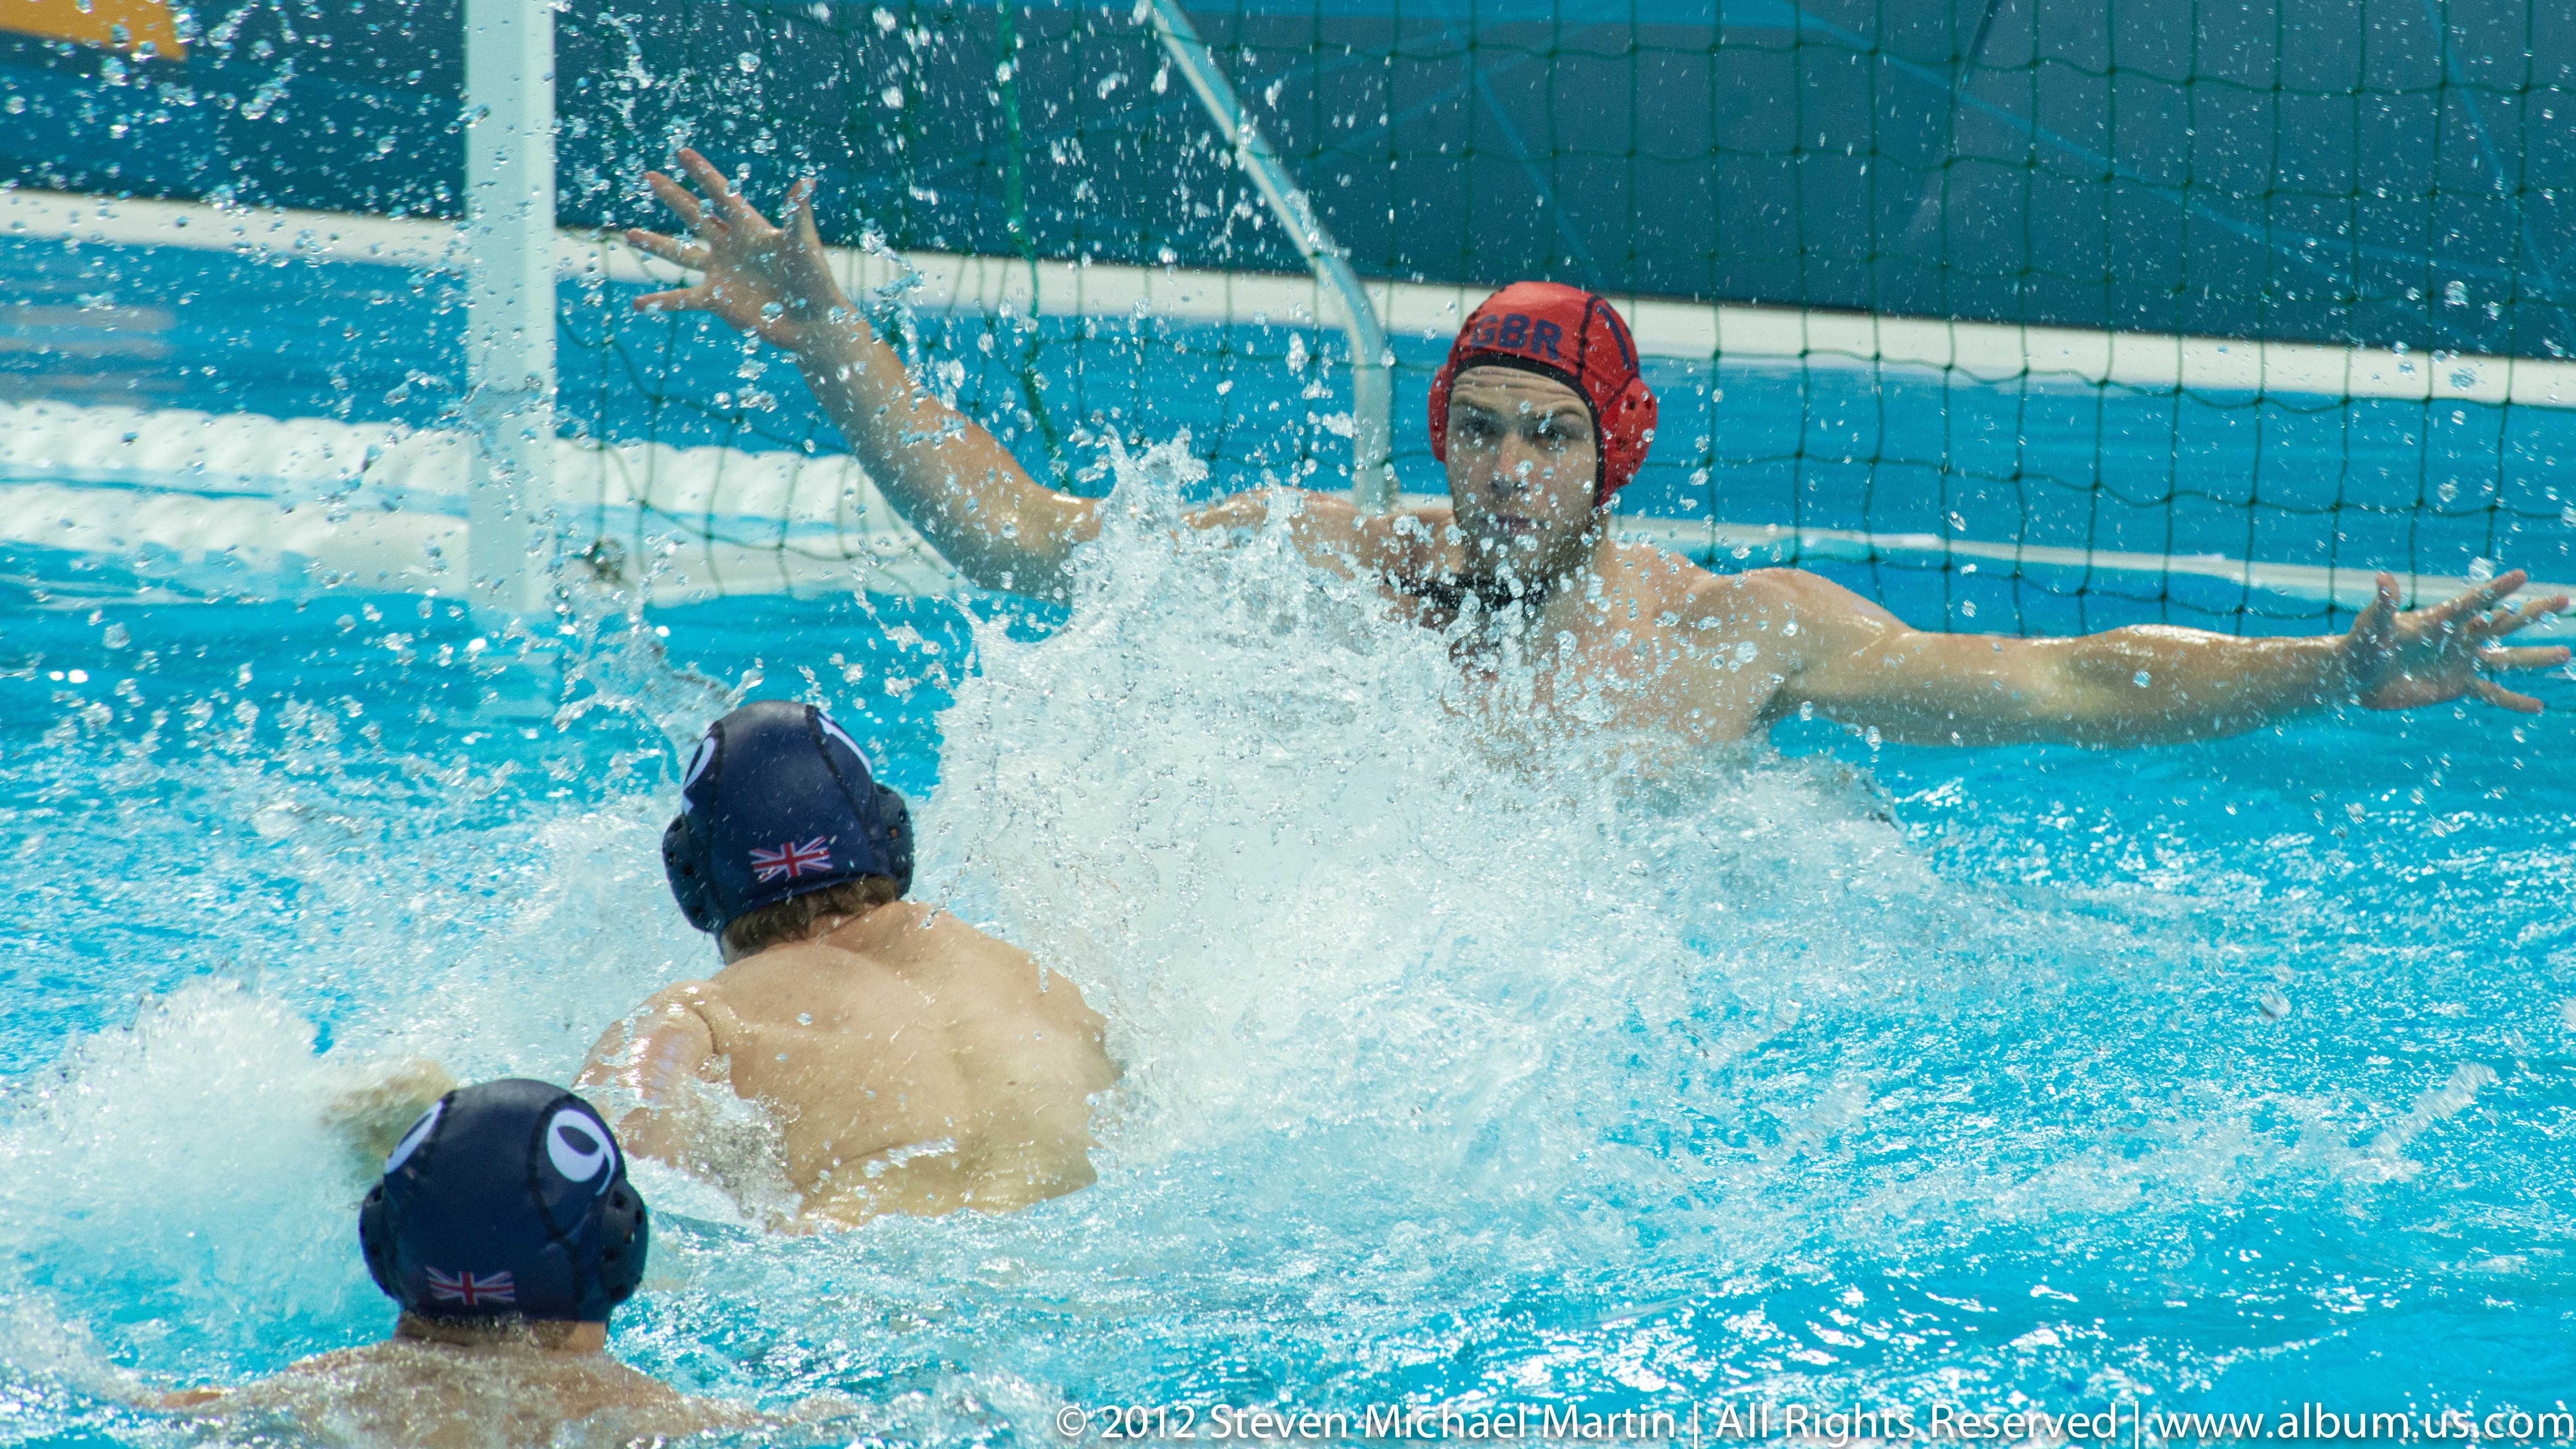 SMartin_2012 Olympics Mens Water Polo_4833021